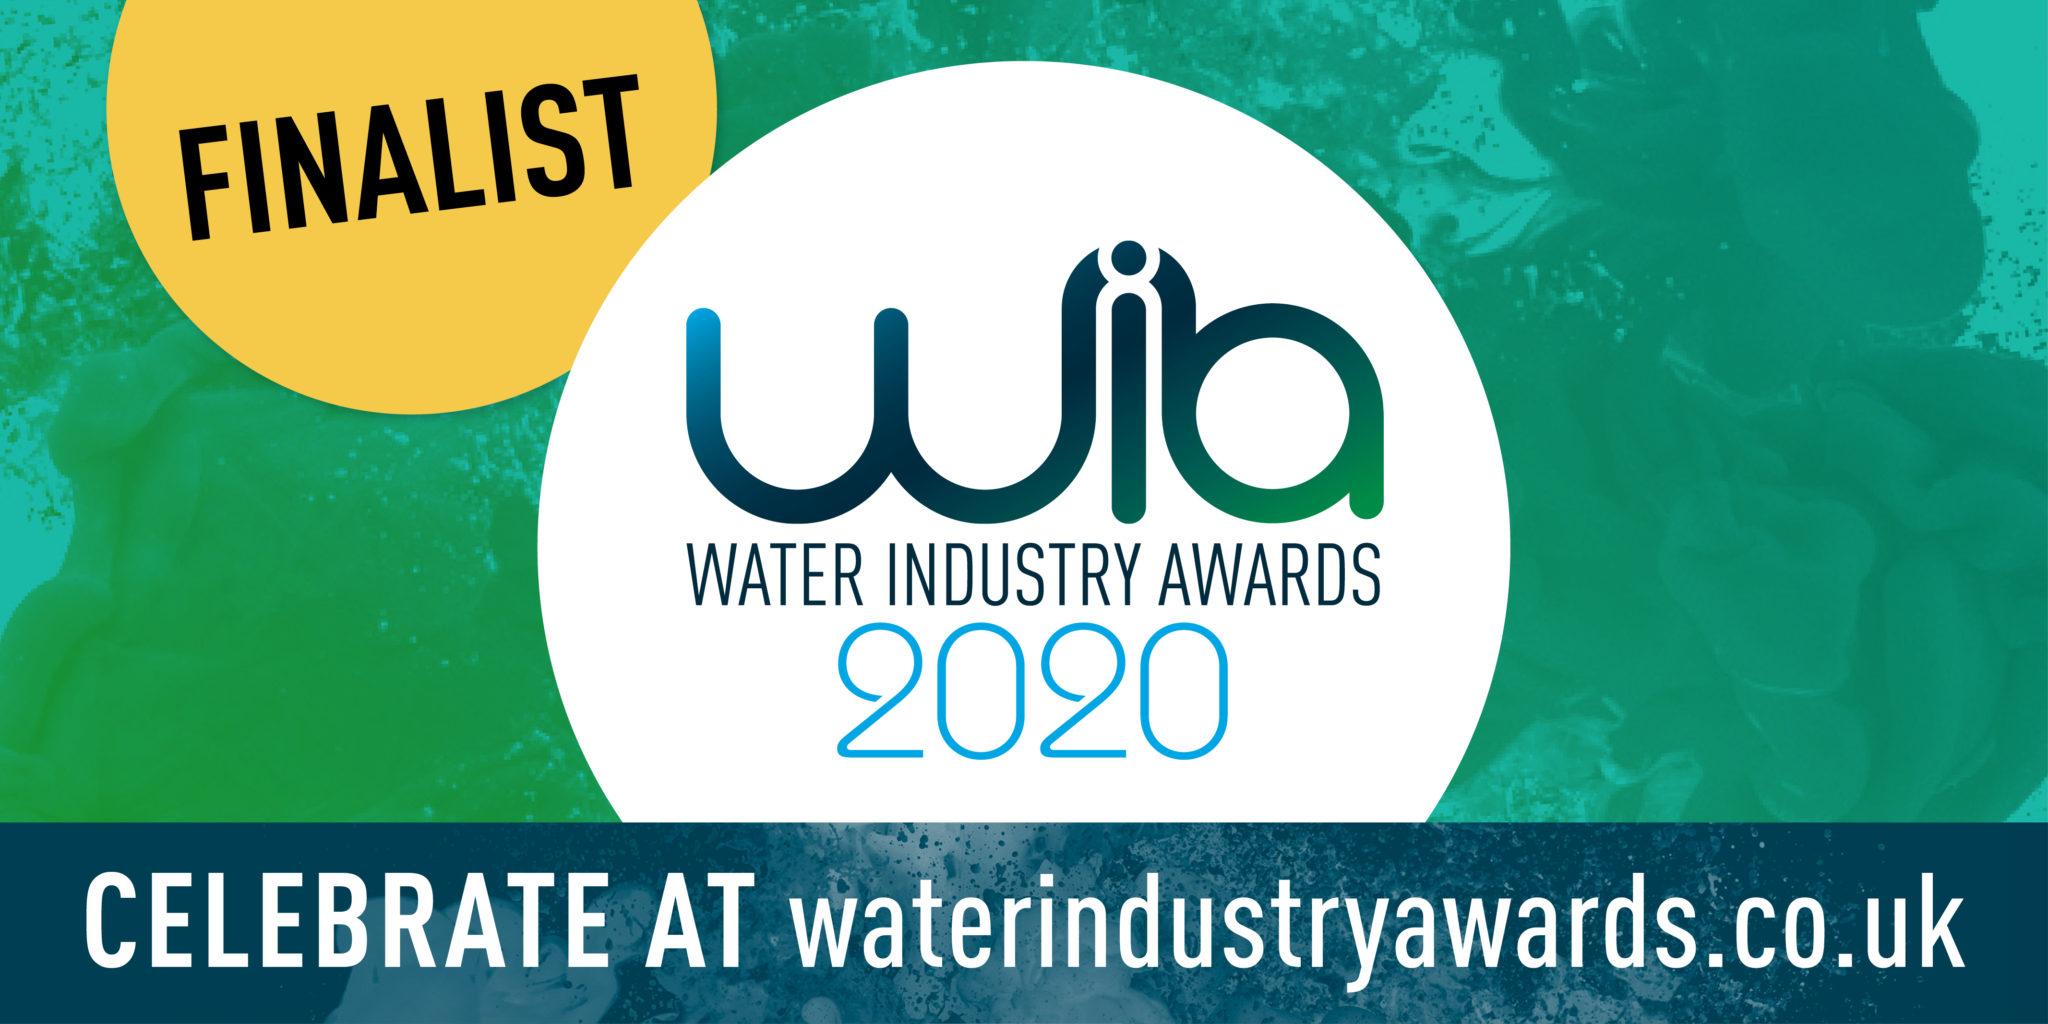 WIA 2020 Finalist banner